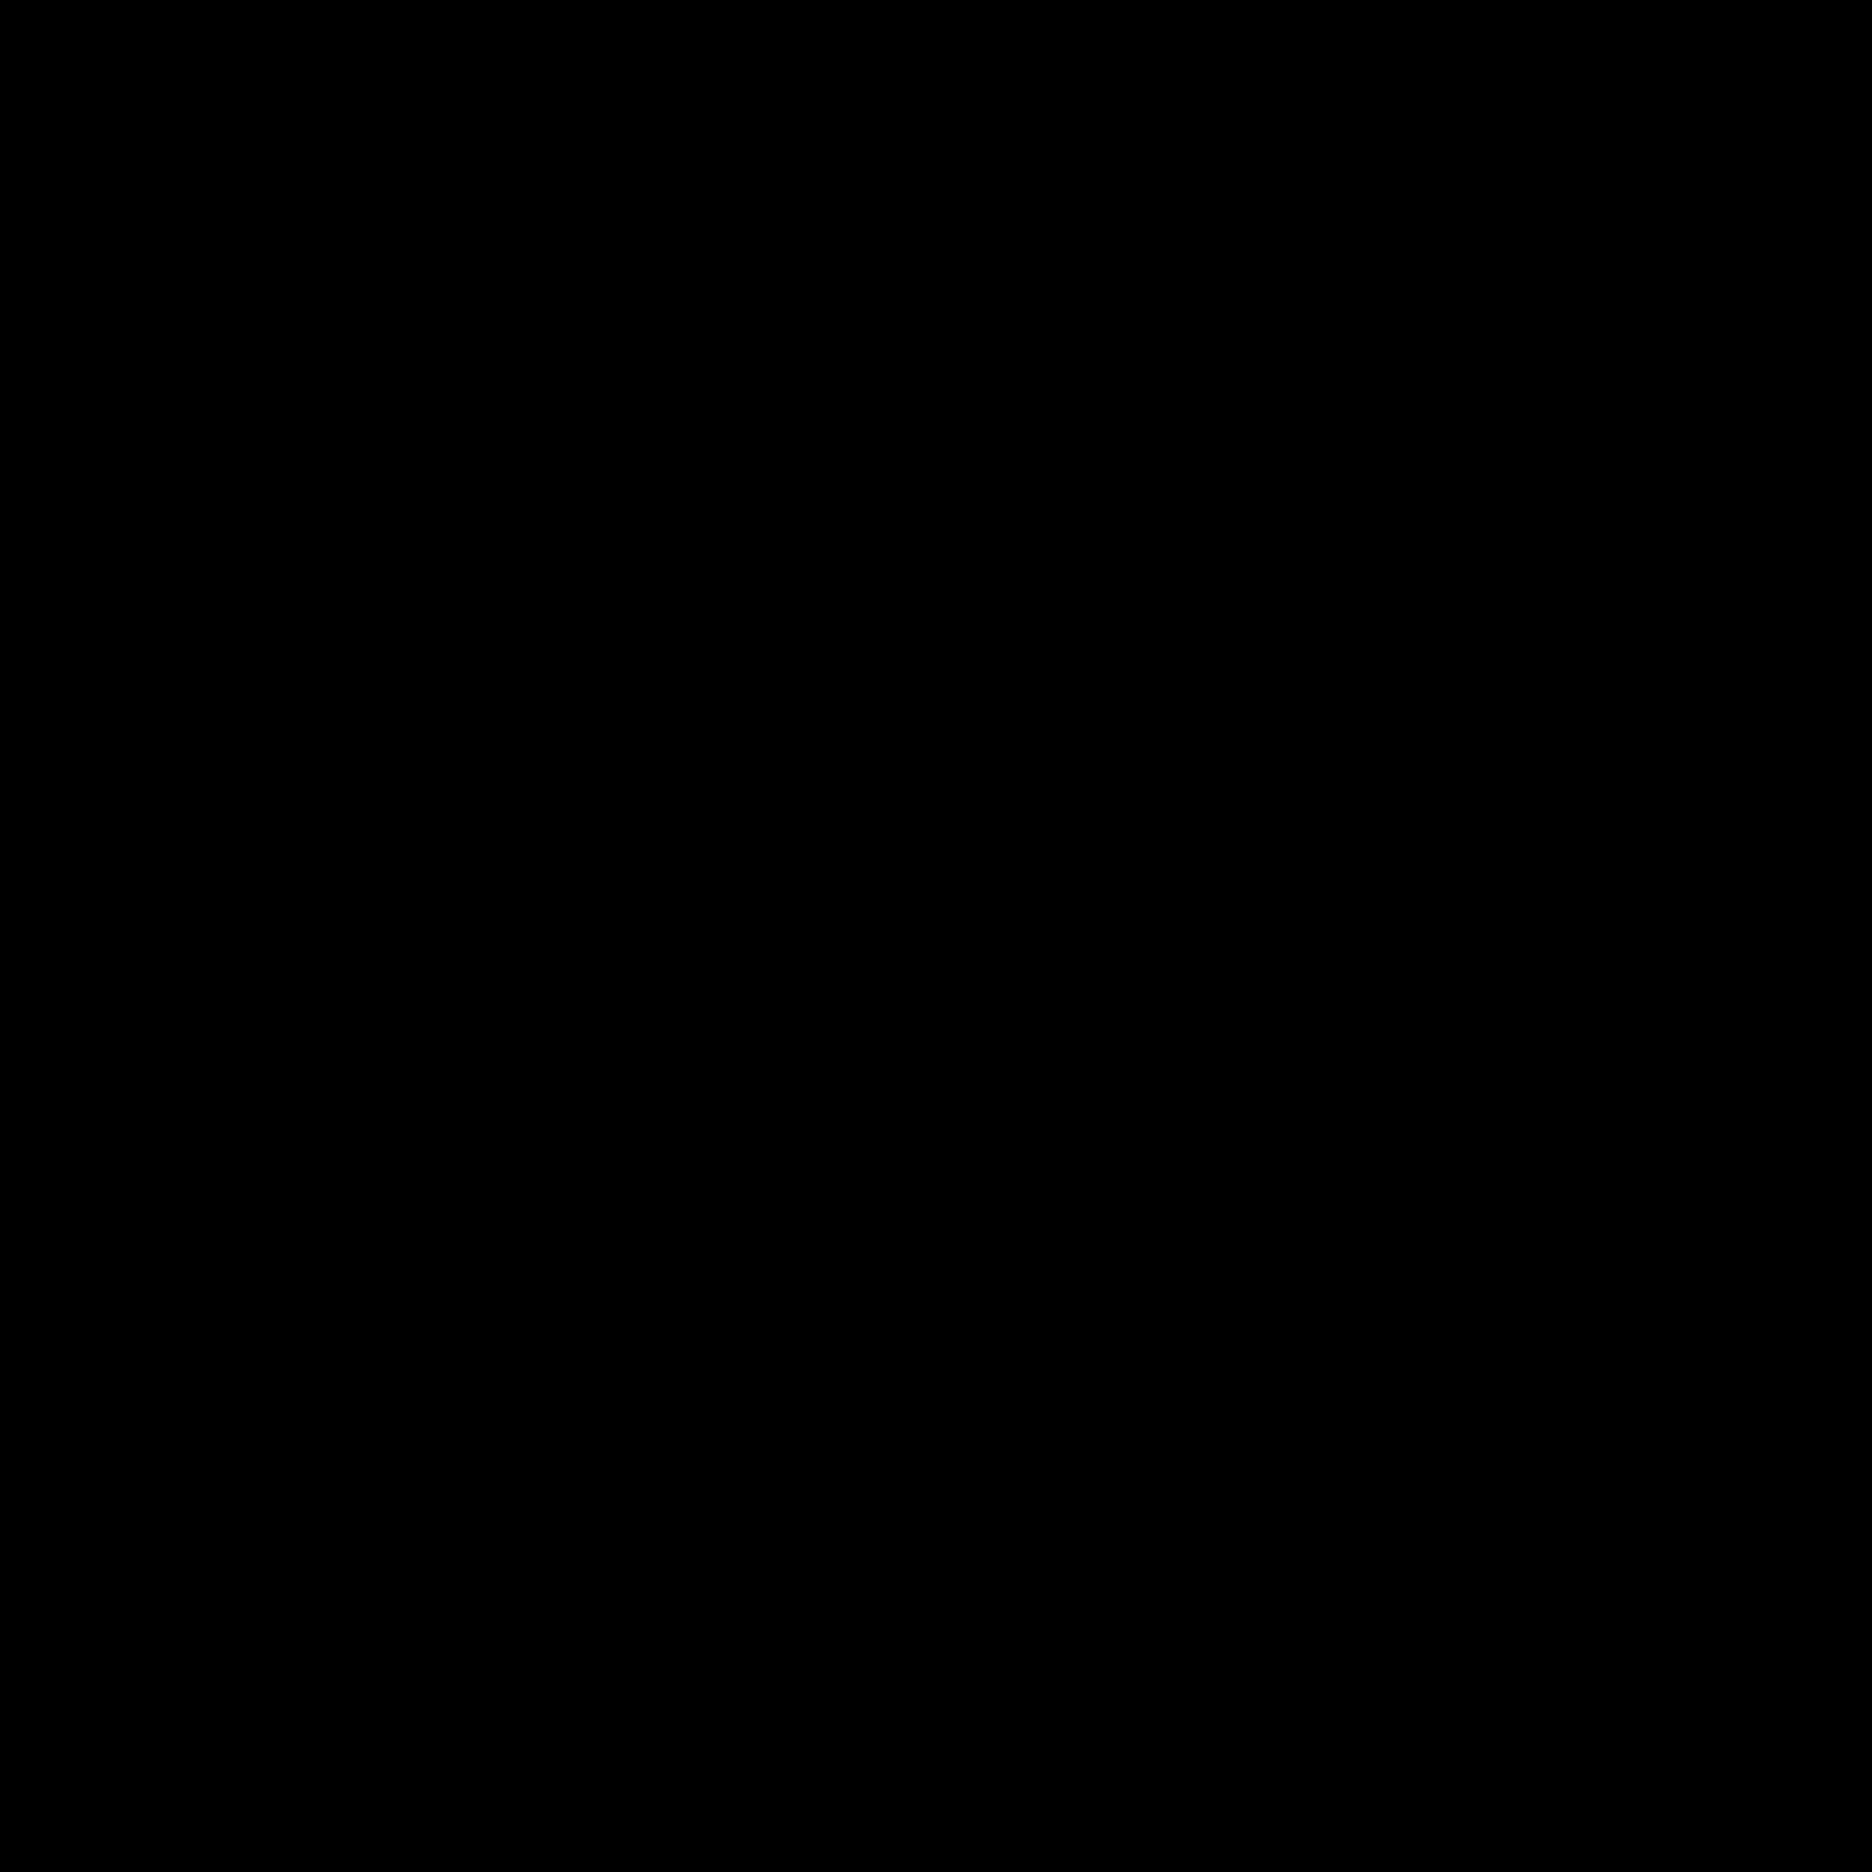 file7-1